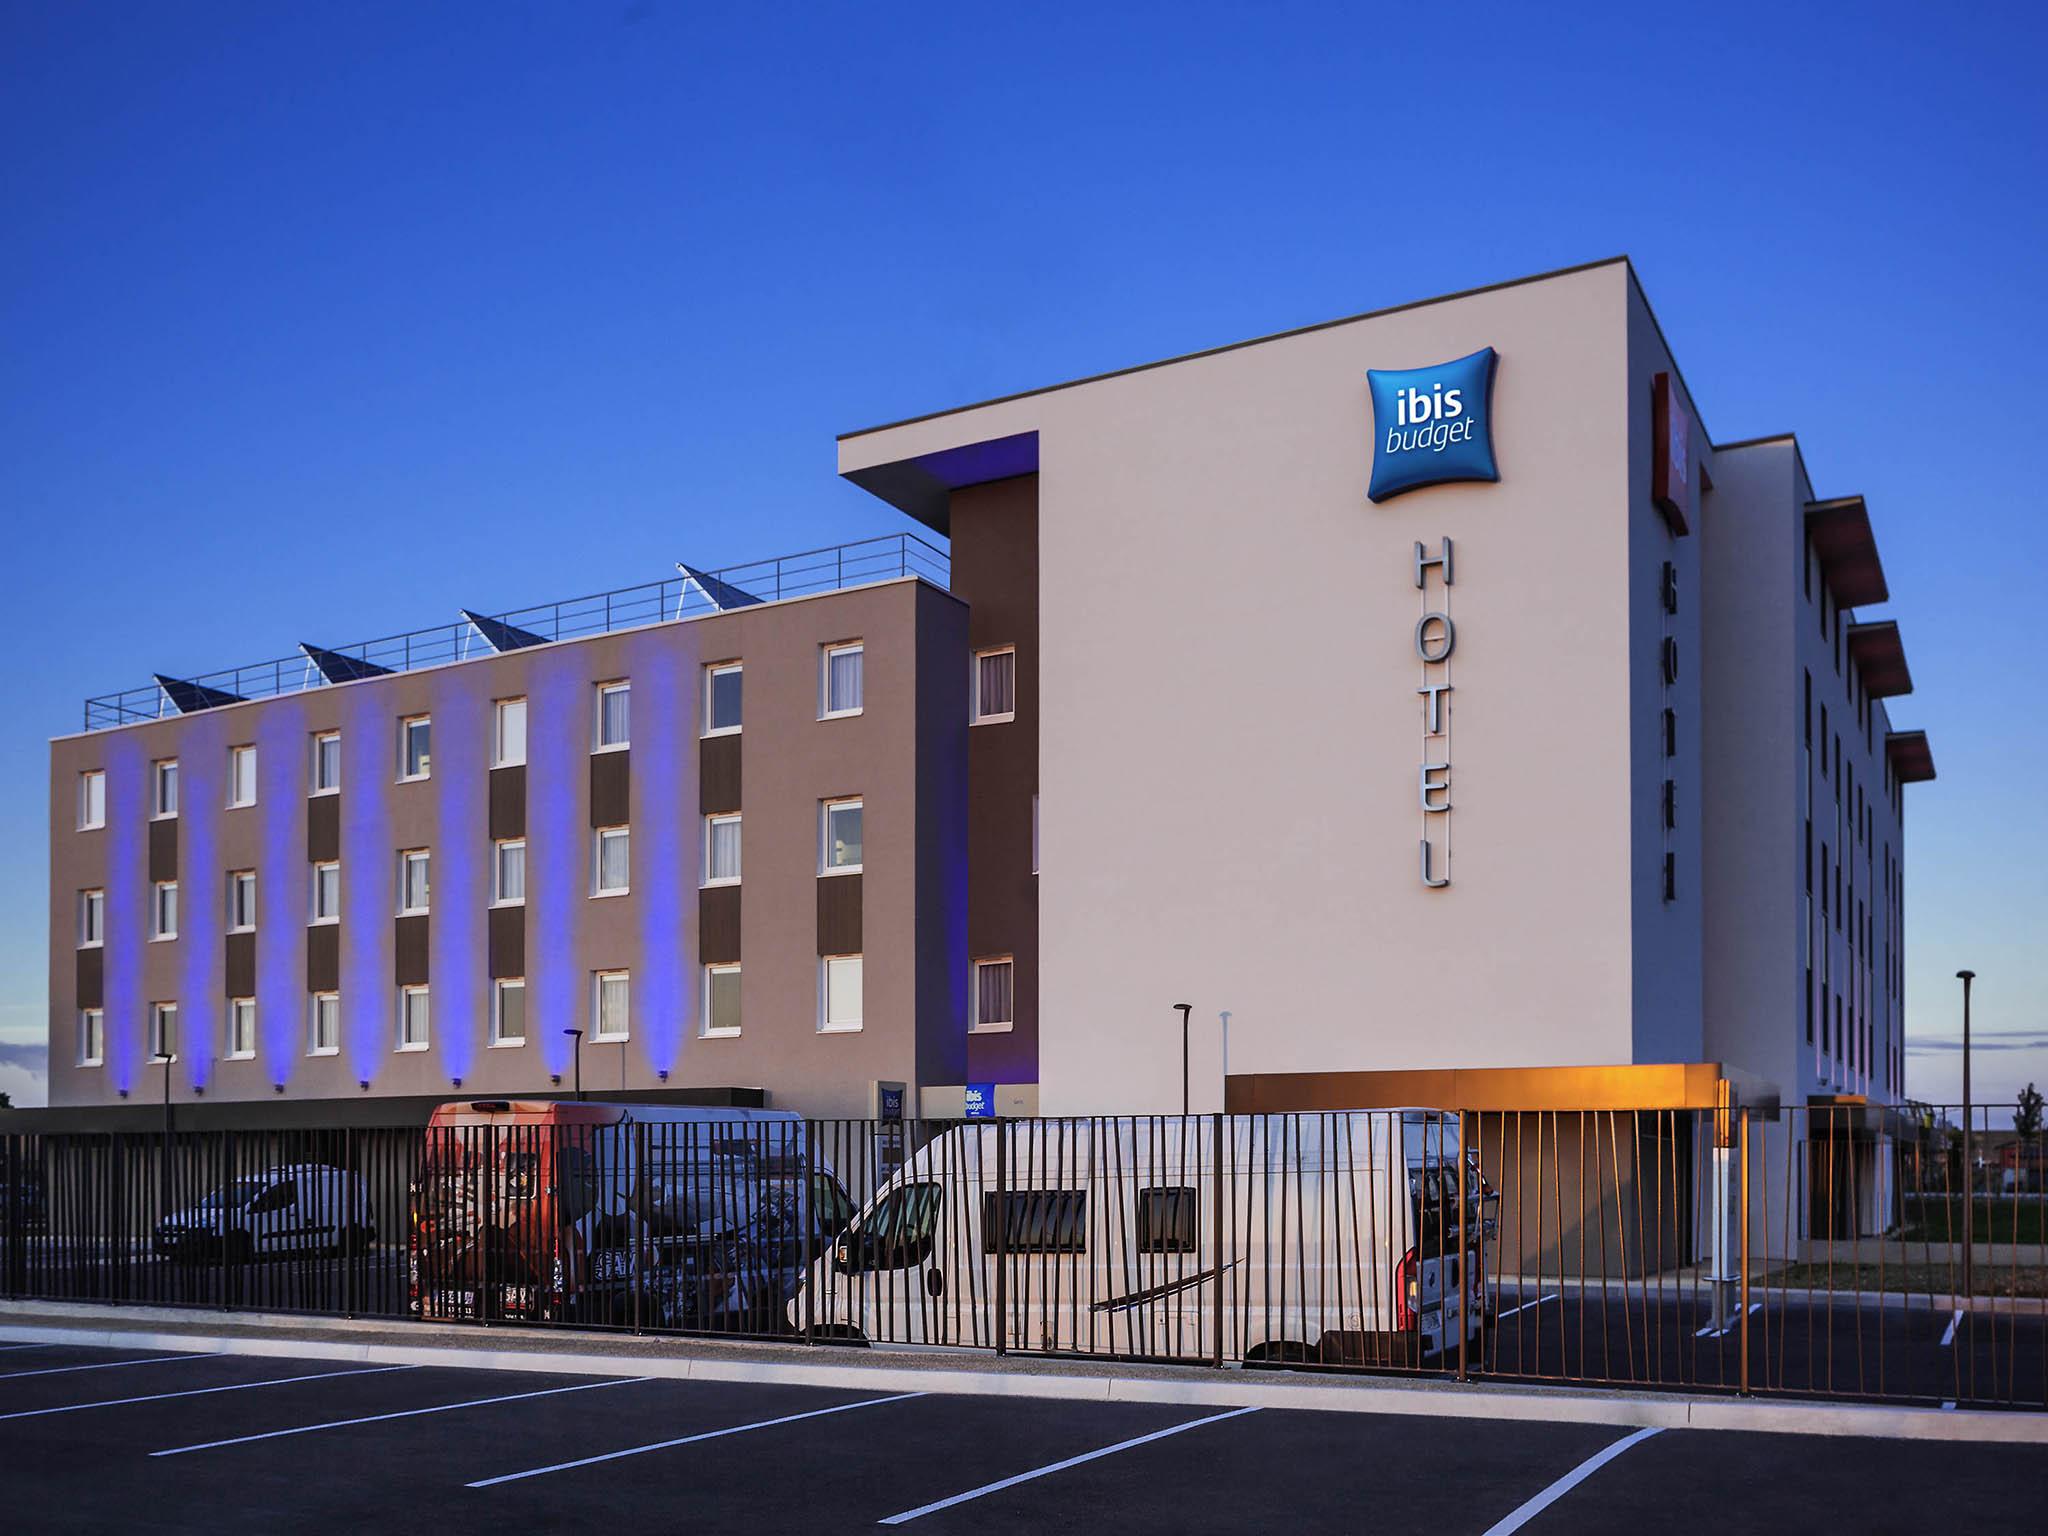 Hotel – ibis budget Sens